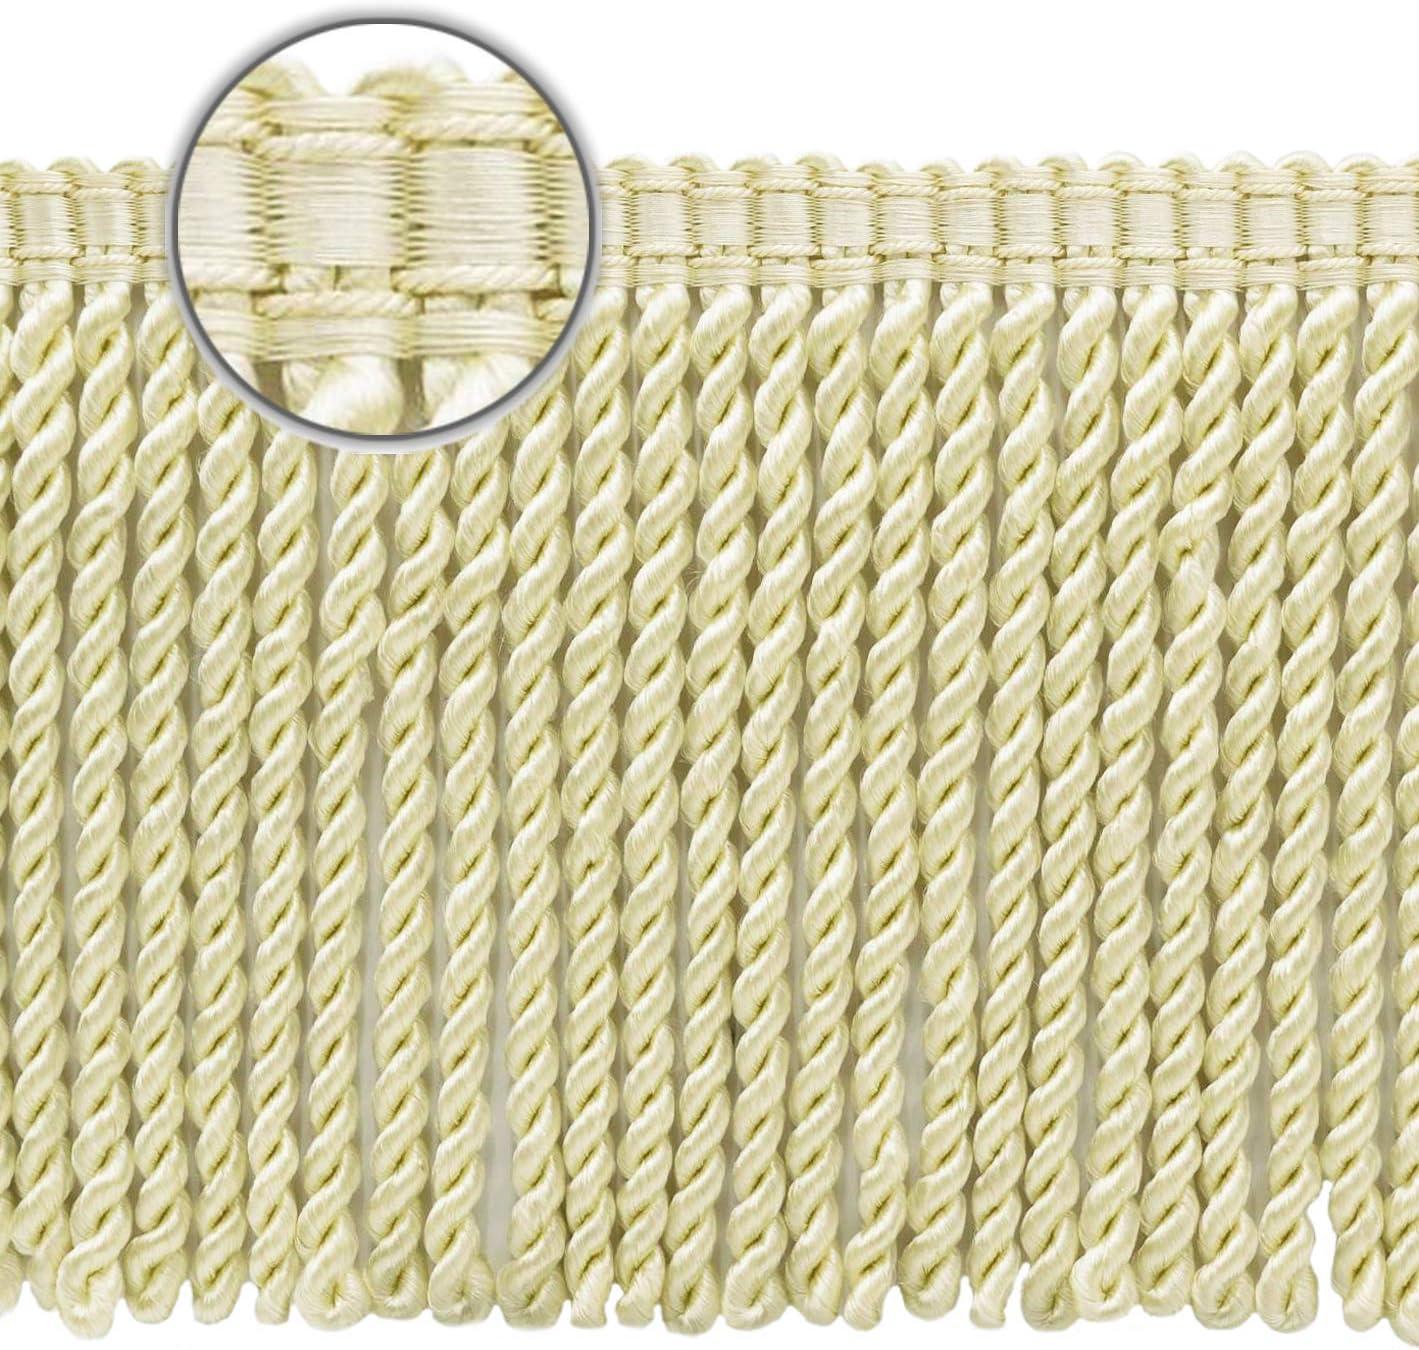 Basic Trim Collection 6 inch Long 7837 Color: A2 5 Yard Value Pack Style# BFS6-WVN 15 Ft // 4.5 Meters Ivory//Ecru Bullion Fringe Trim with Decorative Gimp Design Premium Quality